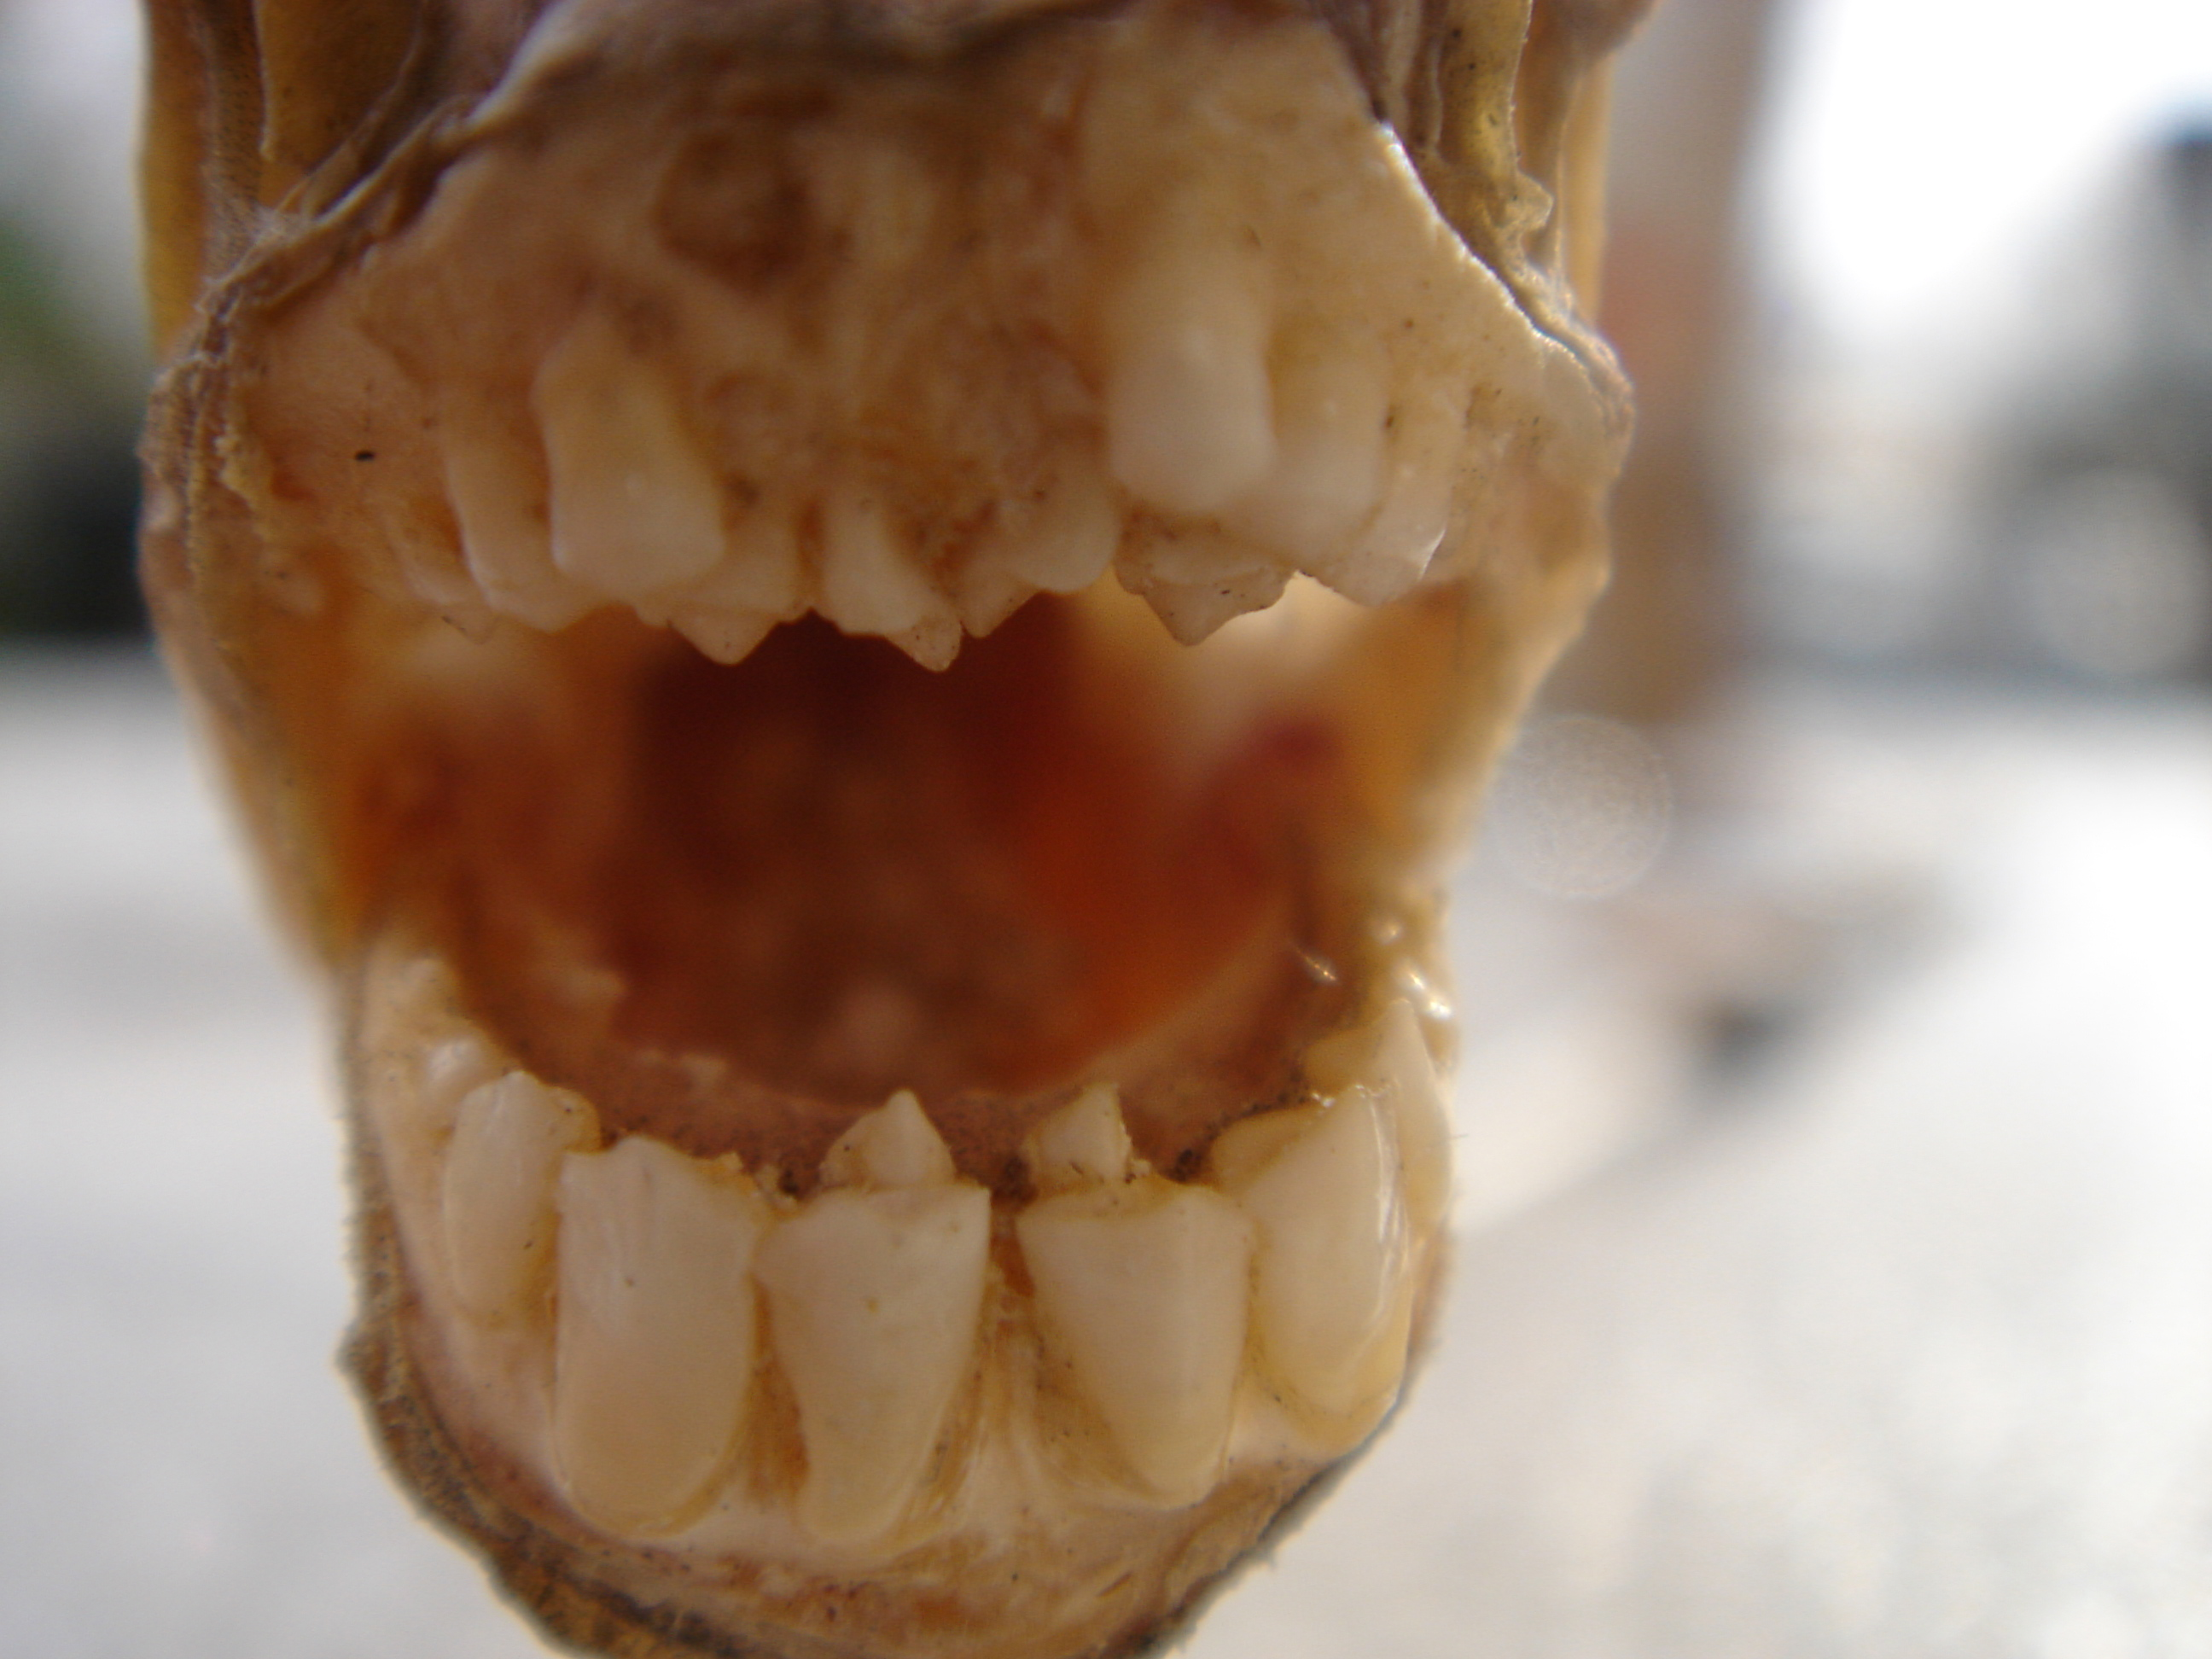 Assorted pacu silver dolar teeth for Pacu fish teeth